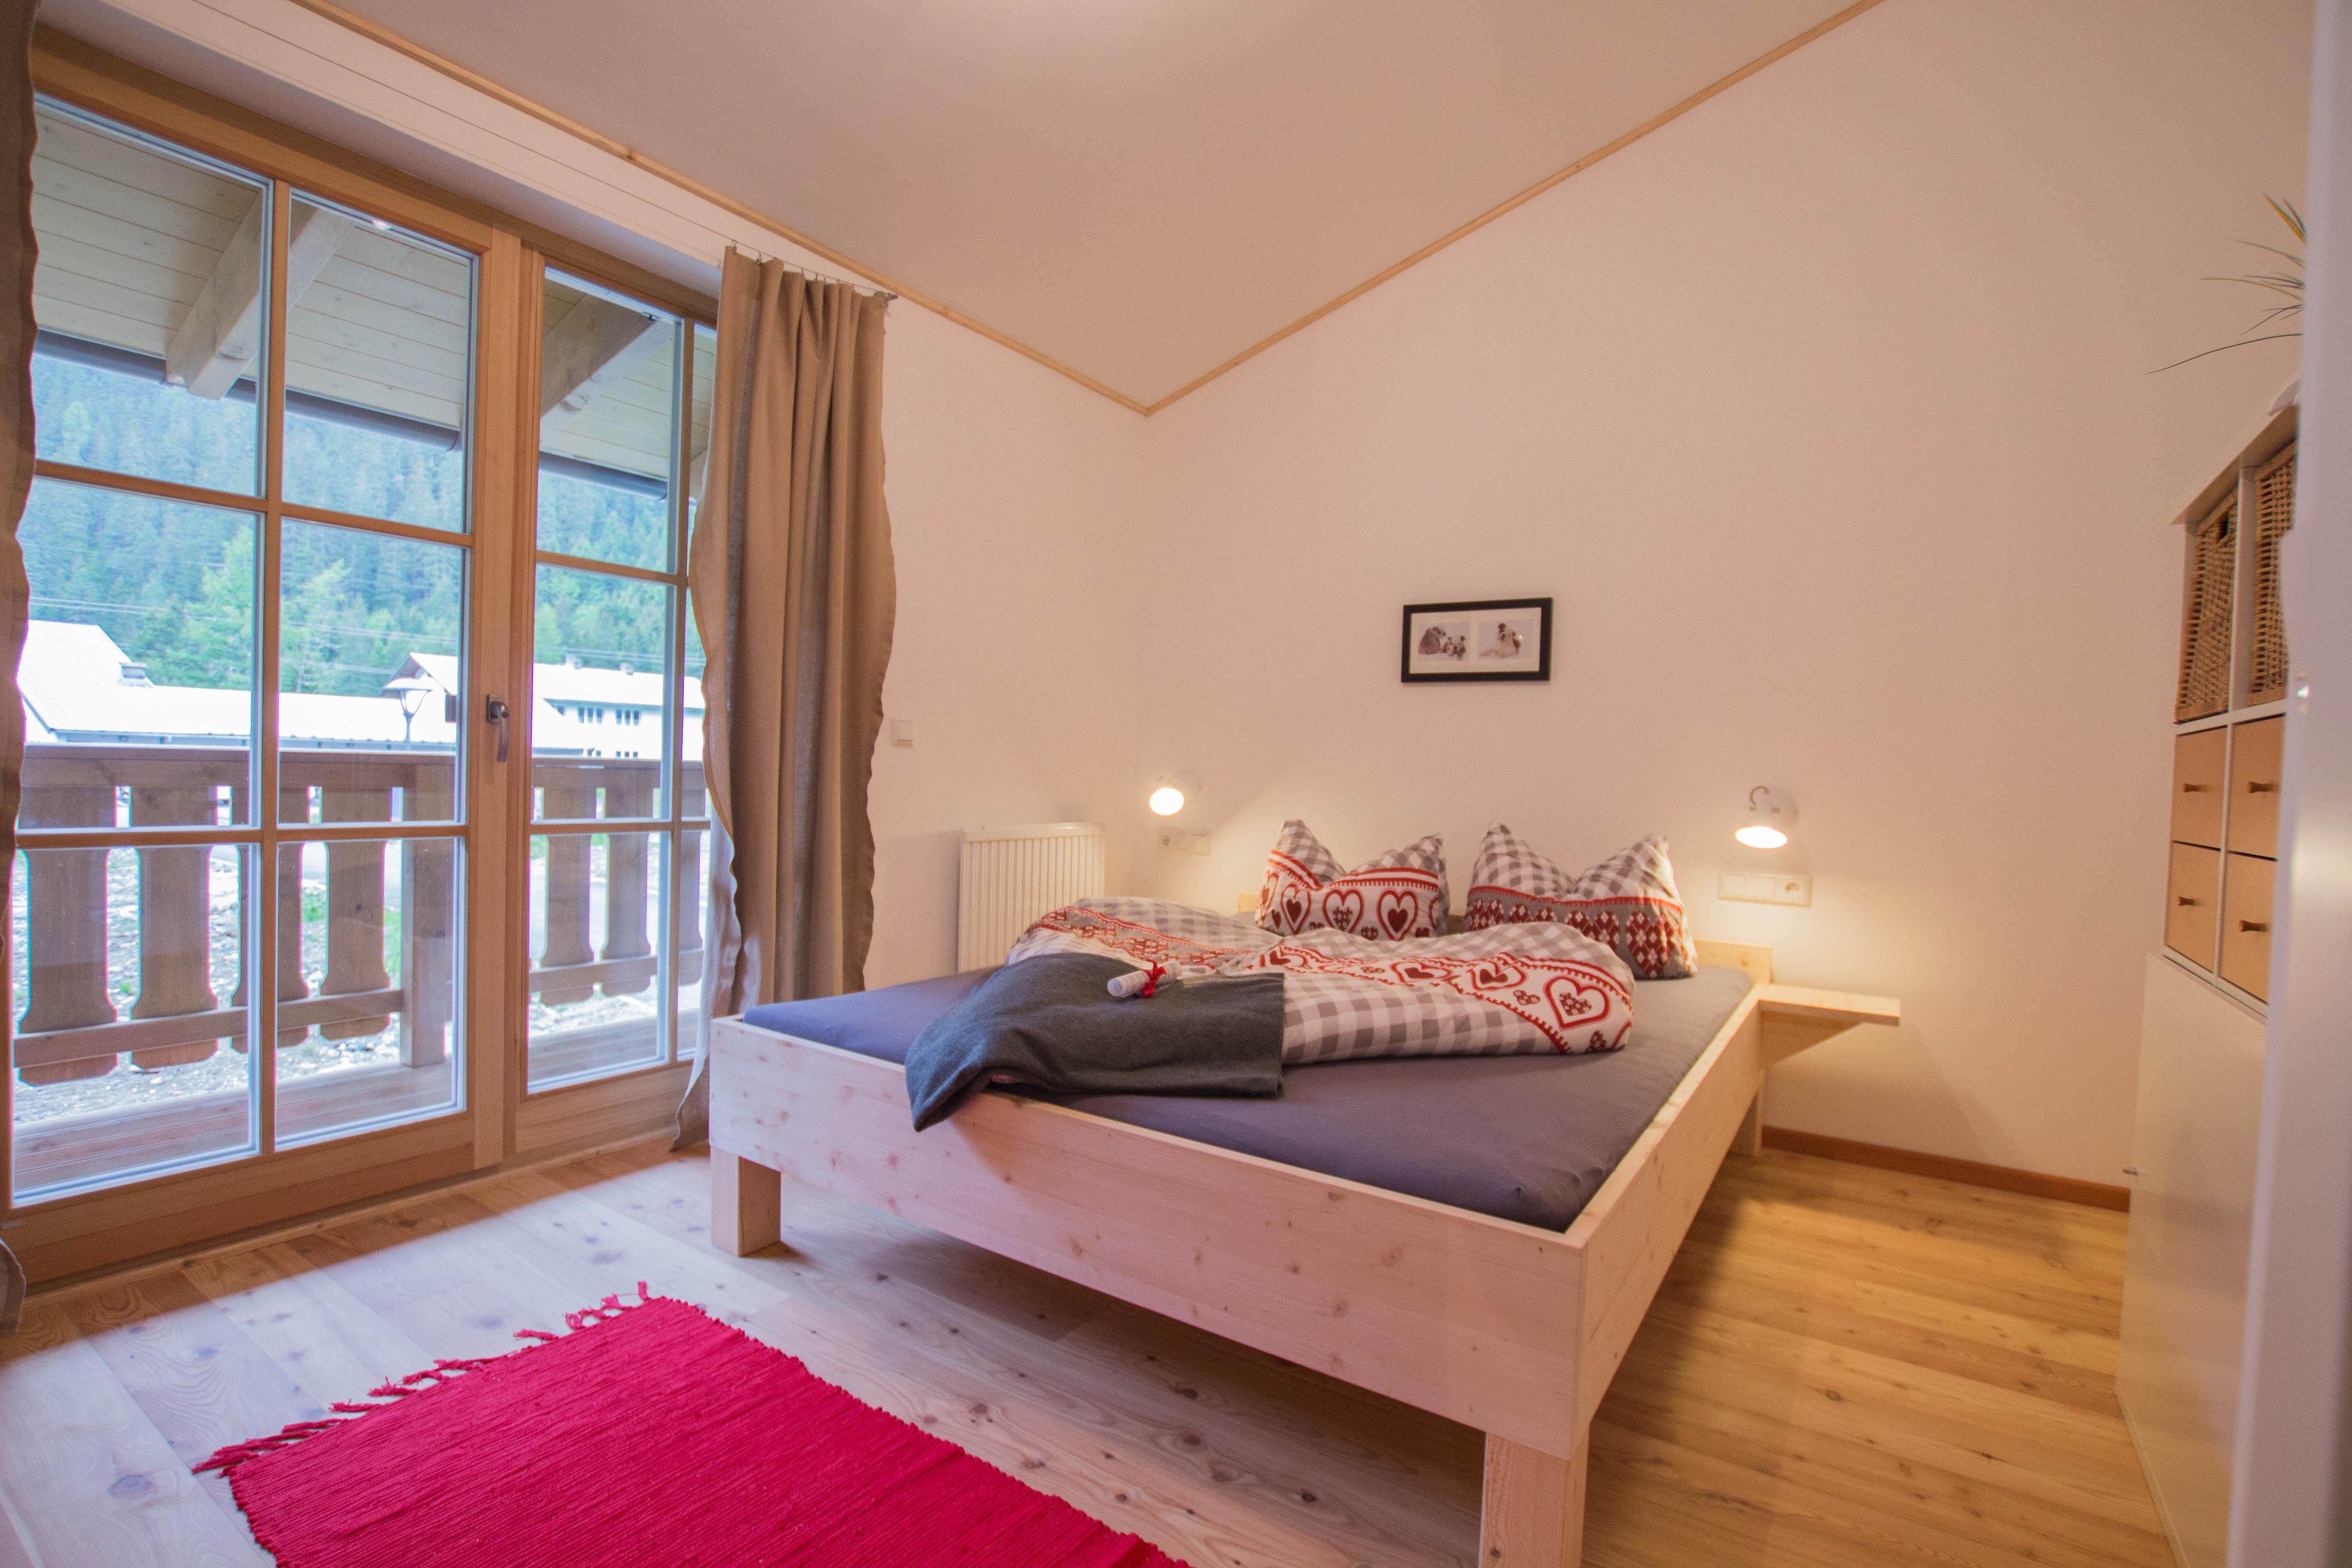 Maison de vacances Lodge Kleiner Bär direkt am Skilift (2050394), Uttendorf, Pinzgau, Salzbourg, Autriche, image 10